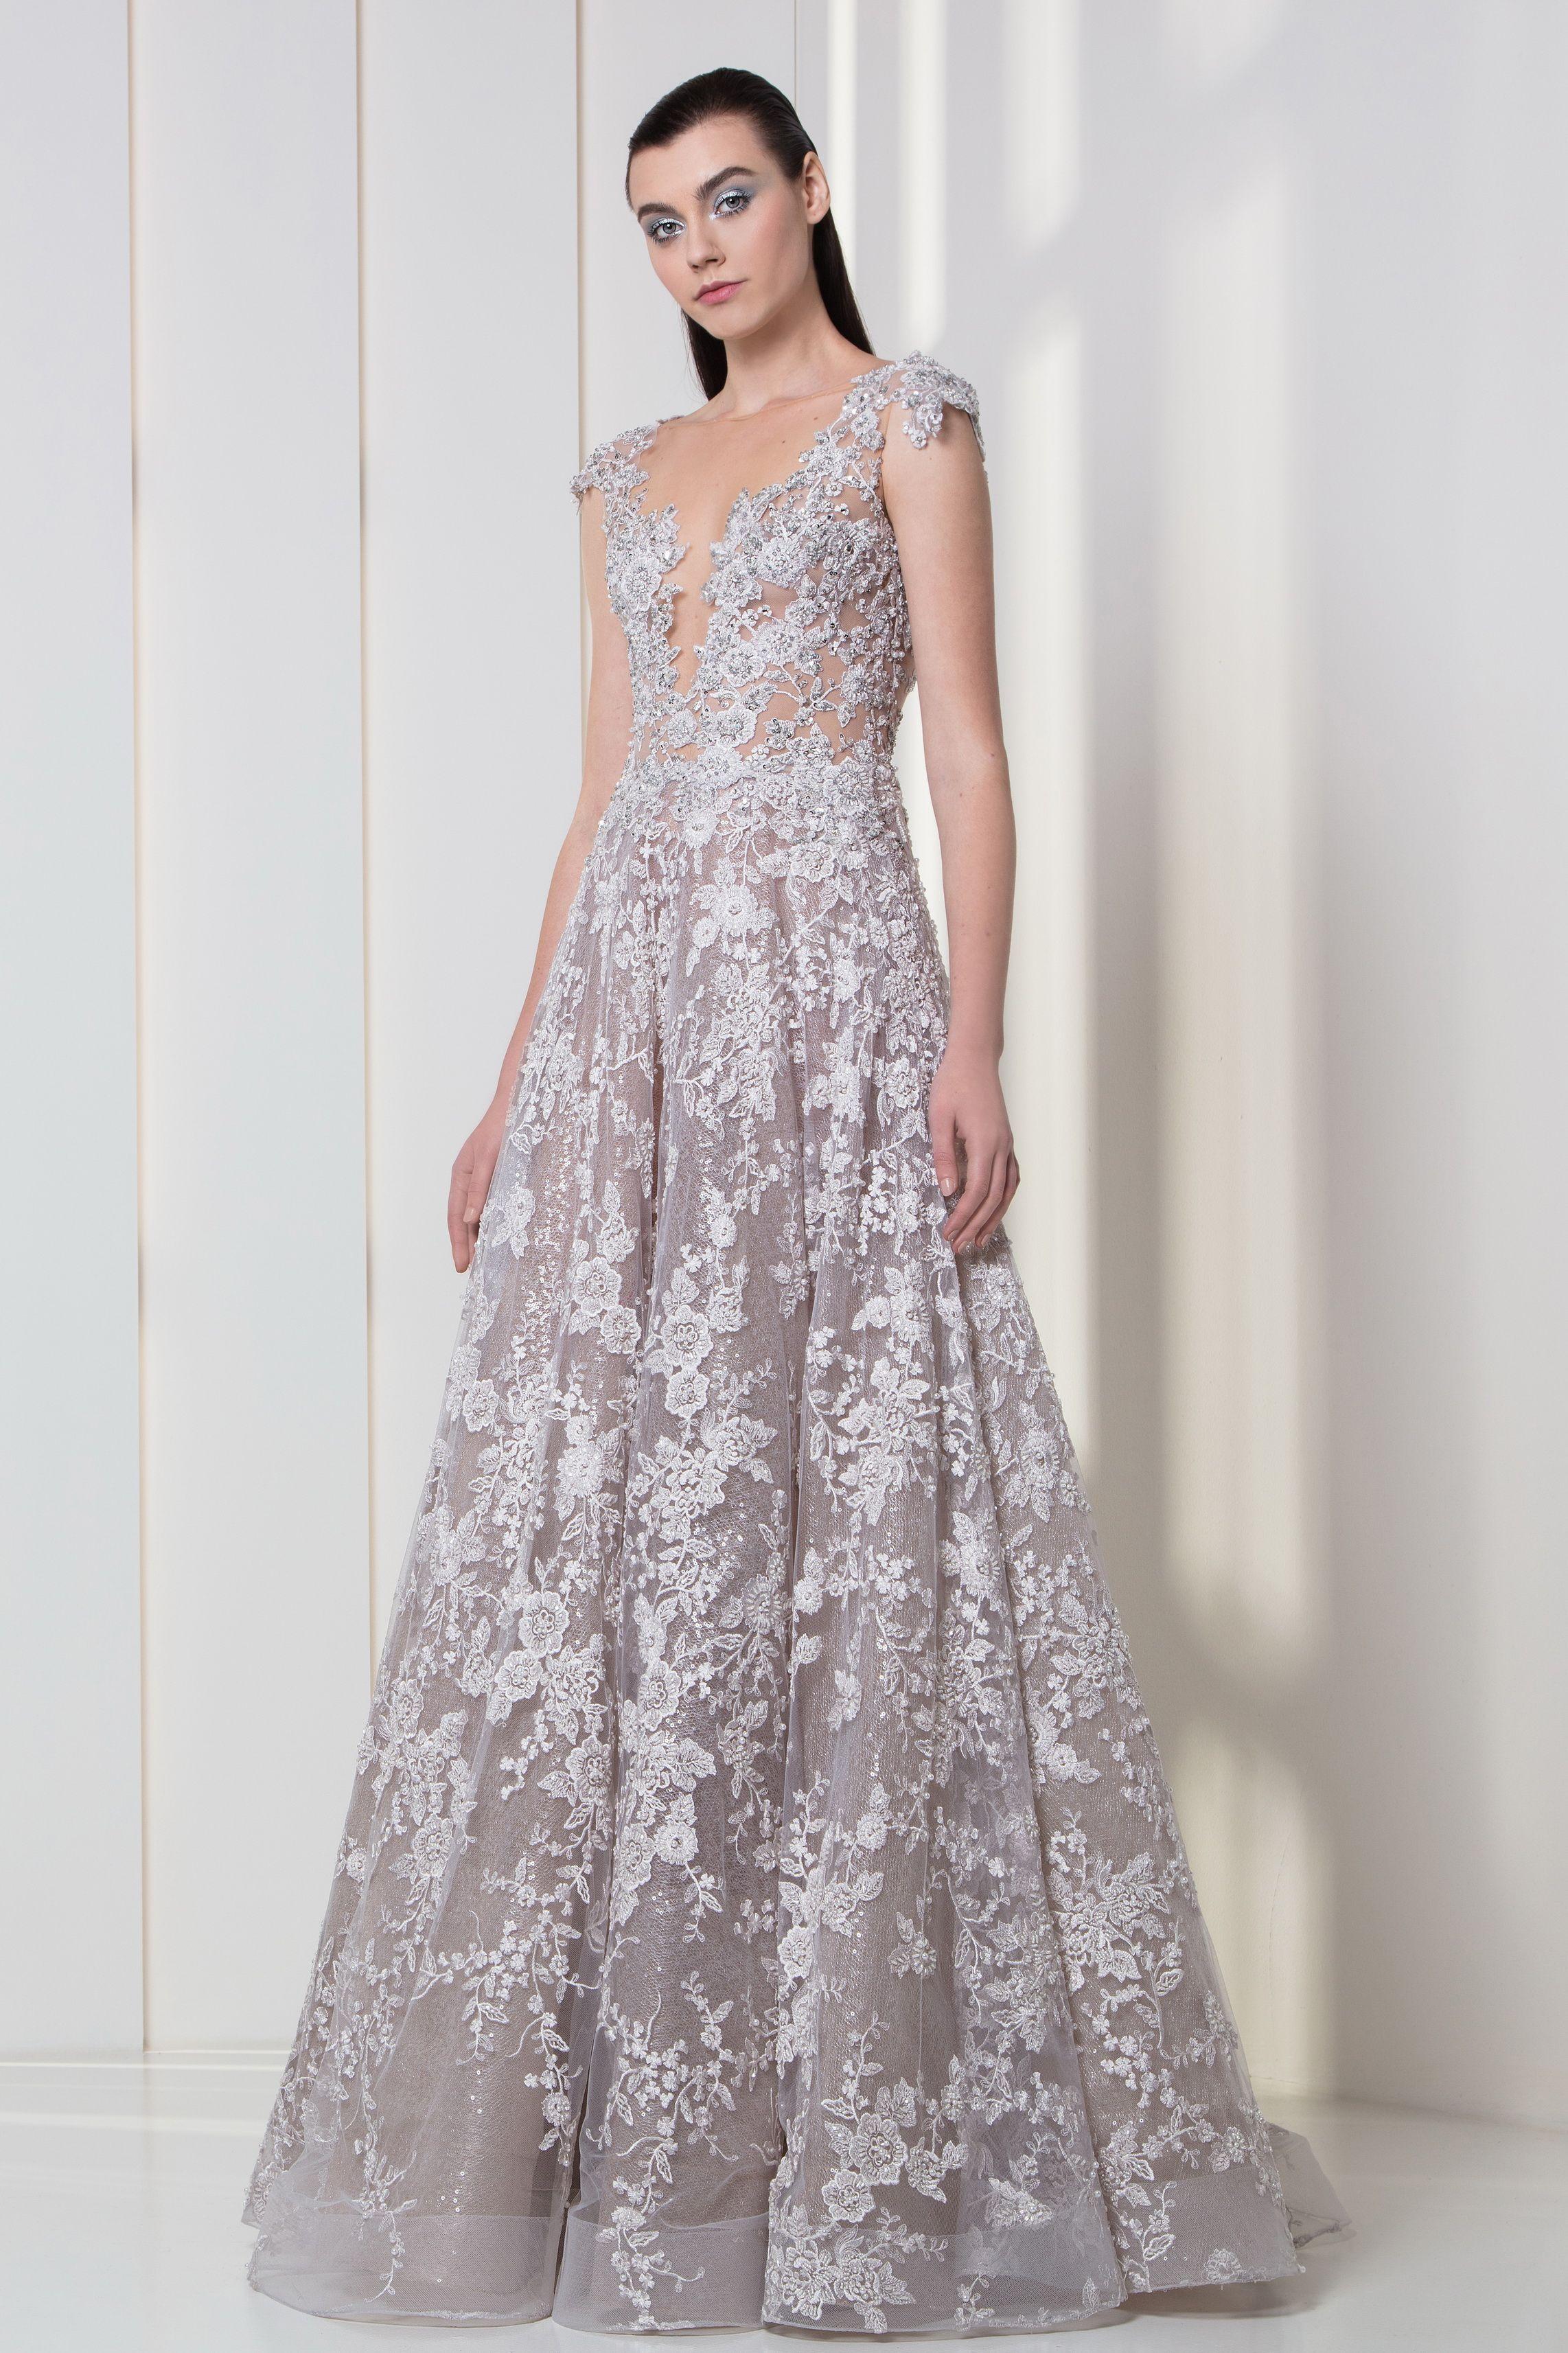 457b83e86a Tony Ward RTW FW 17 18 I Style 36 I Silver lilac dress in tulle ...